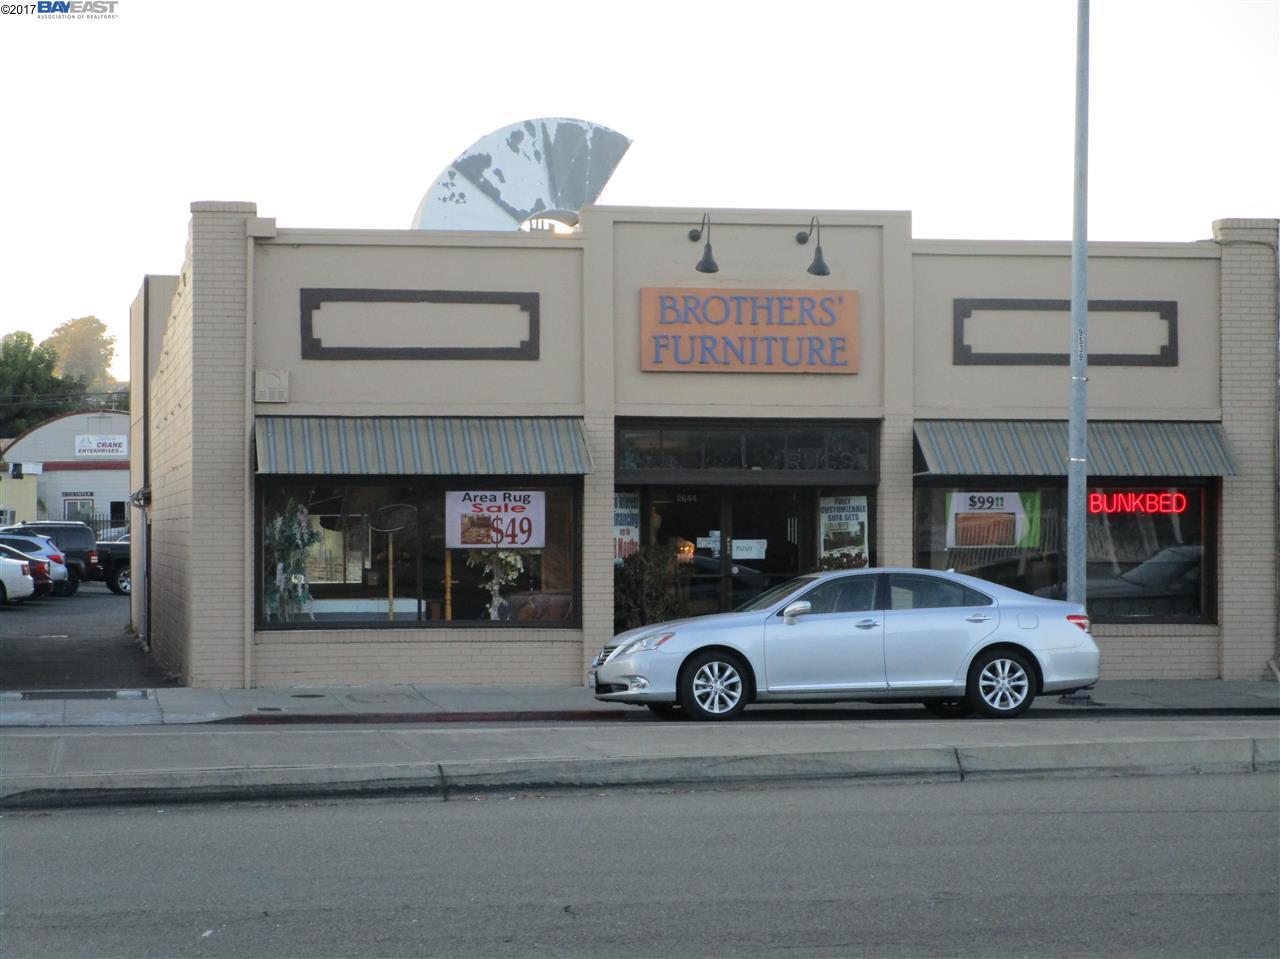 Commercial للـ Sale في 2644 CASTRO VALLEY BLVD 2644 CASTRO VALLEY BLVD Castro Valley, California 94546 United States